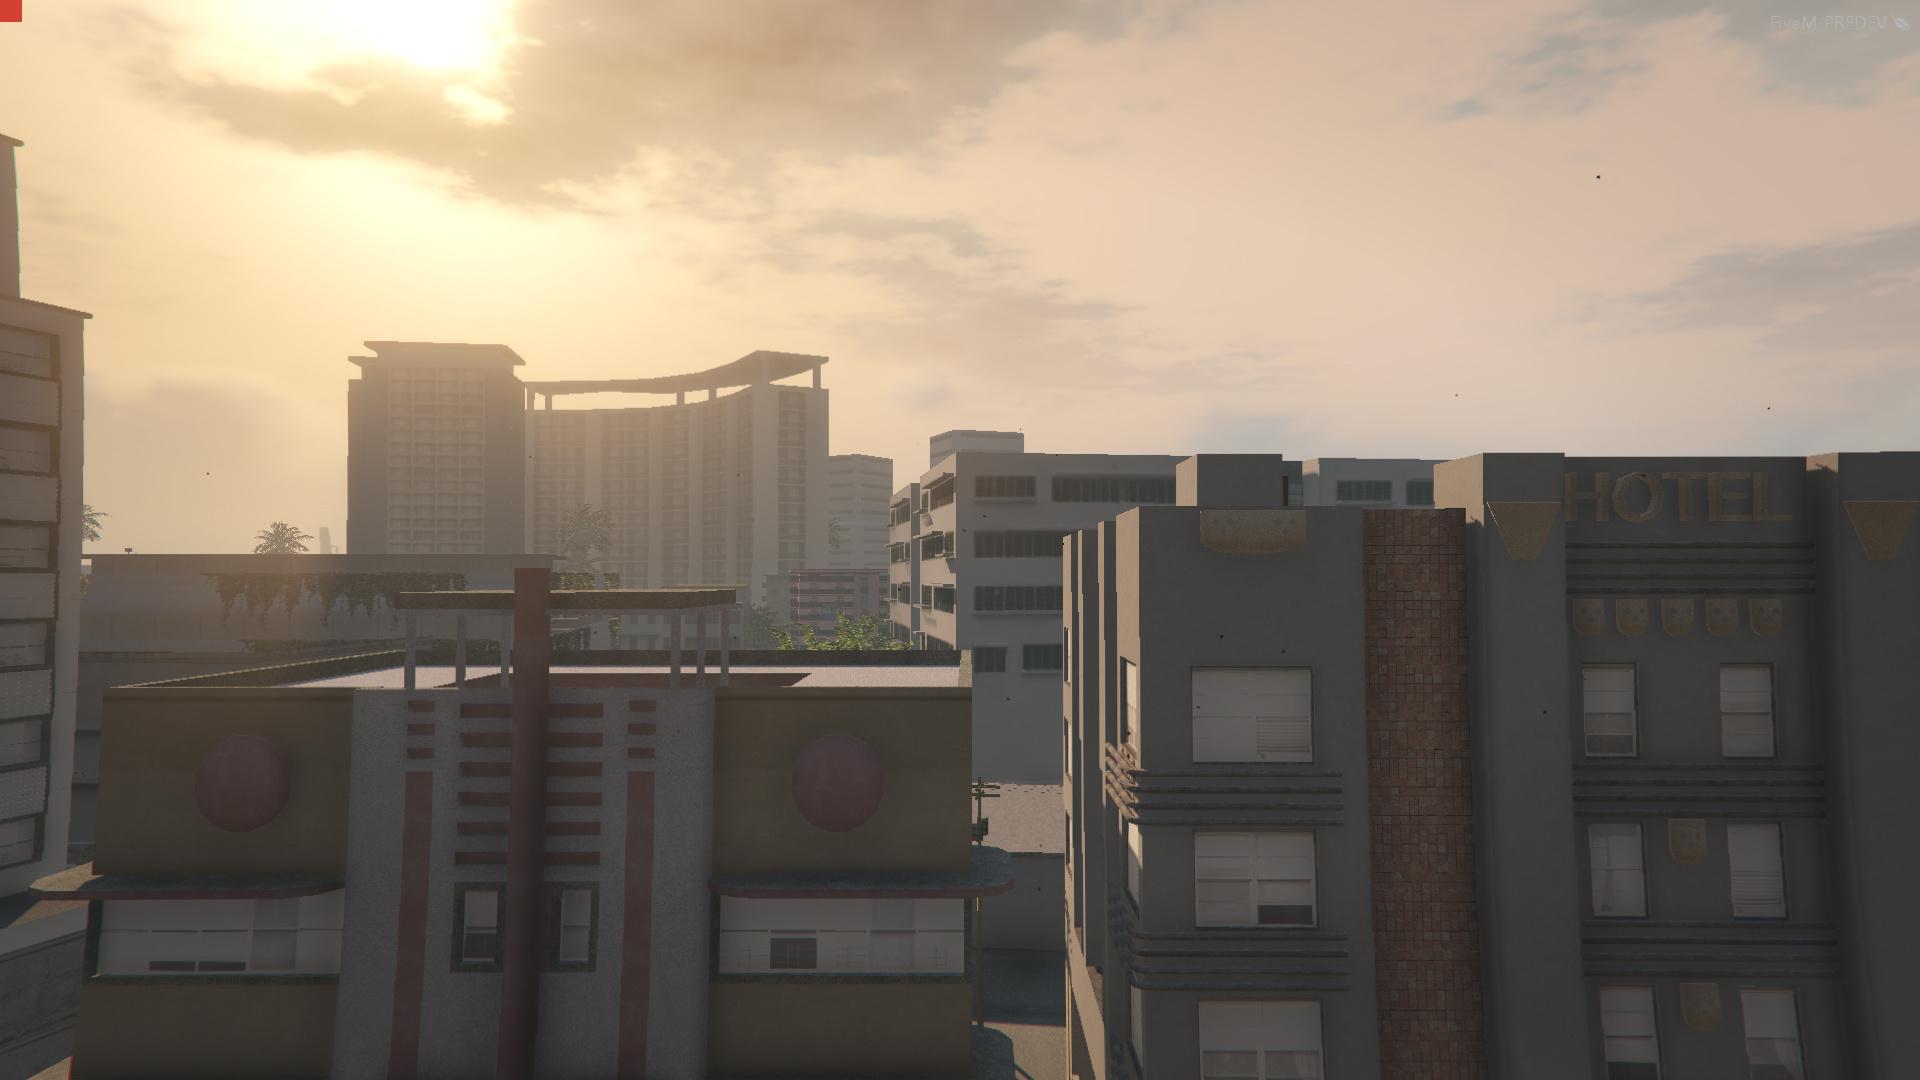 gta vice city setup free download utorrent